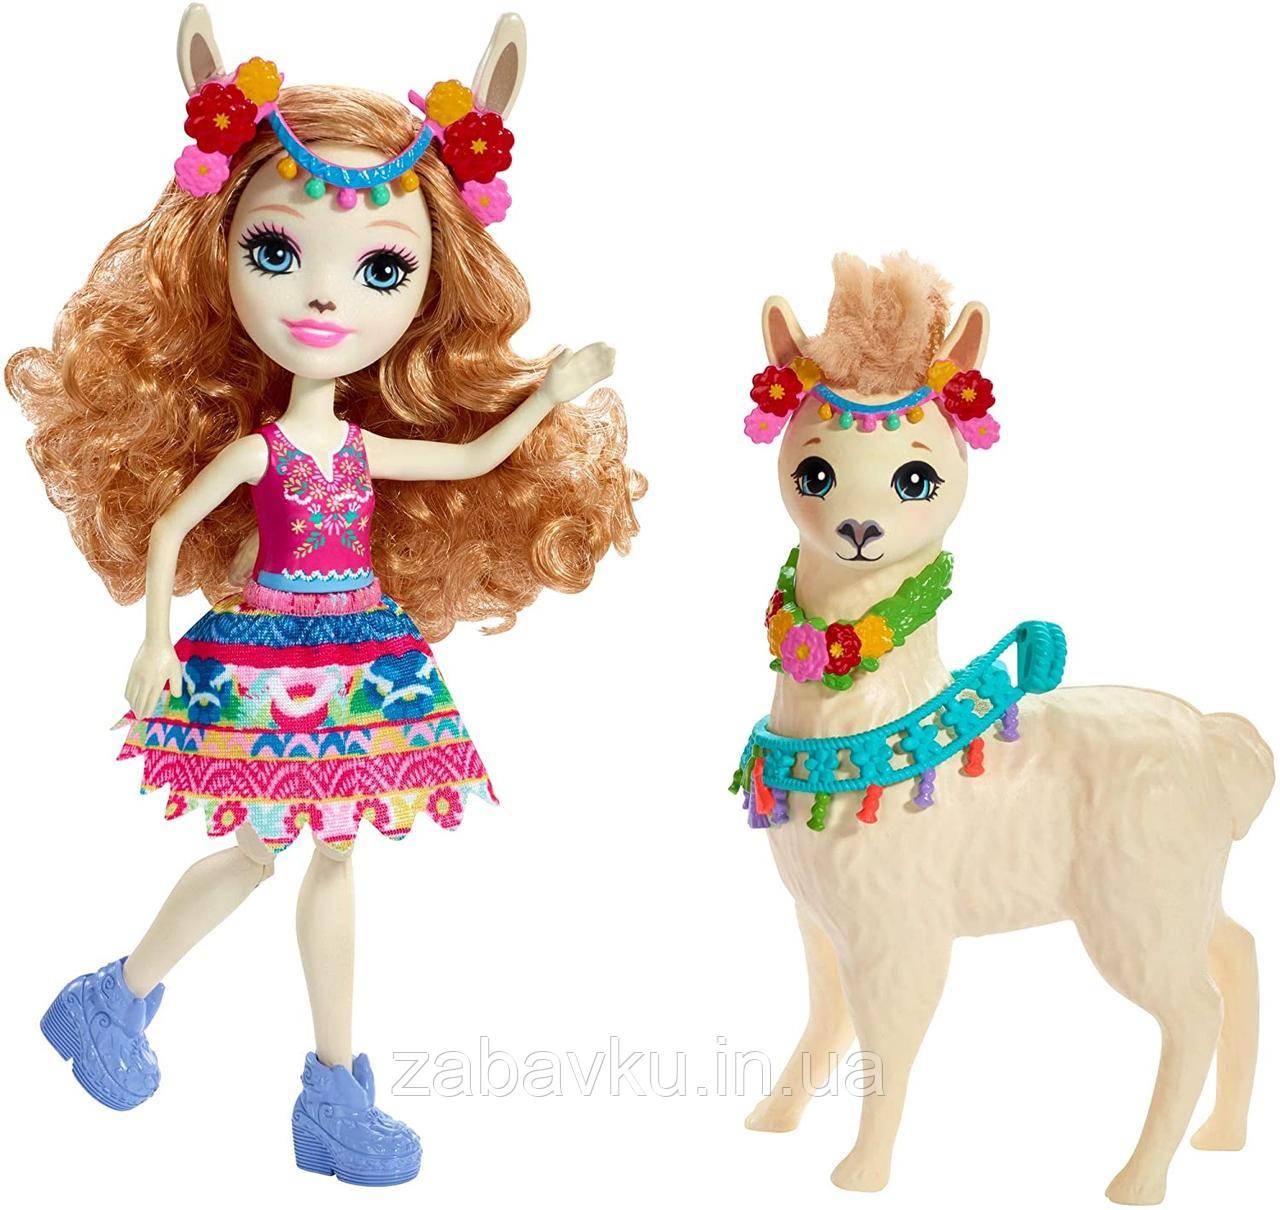 Enchantimals Lluella Llama Doll & Fleecy Figure Енчантімалс Лама Энчантималс